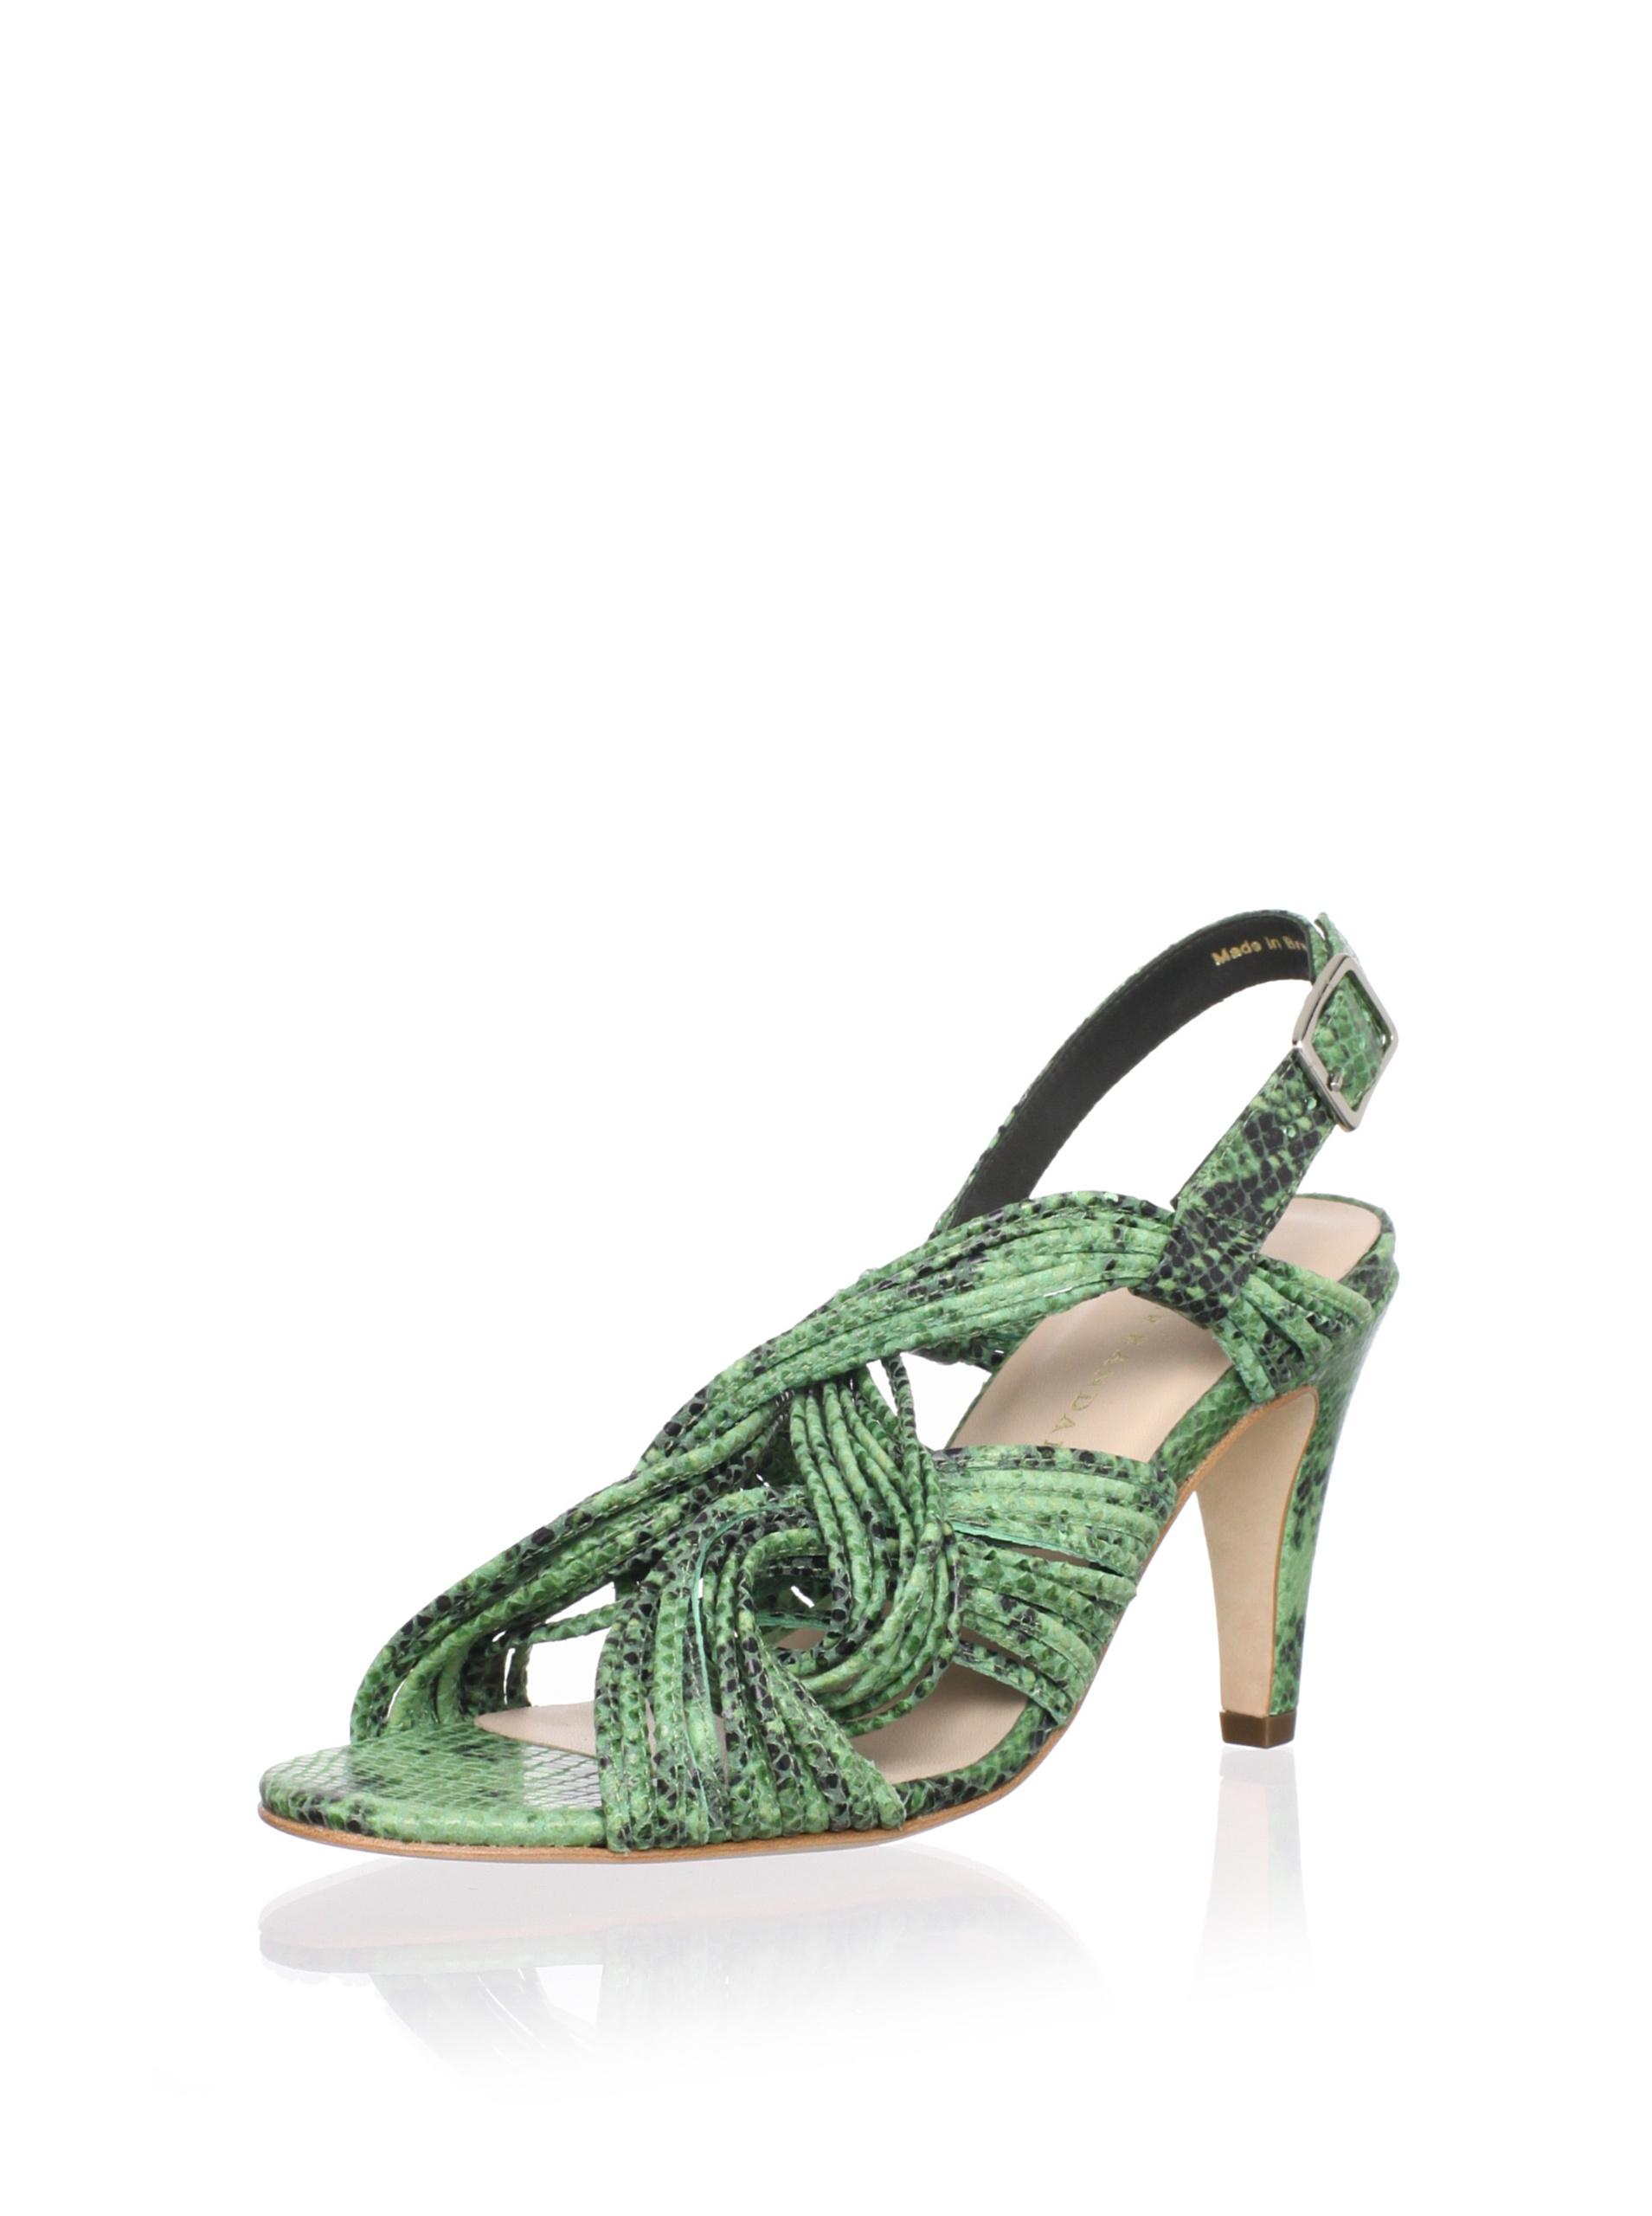 Loeffler Randall Women's Roanne Mignon Mid-Heel Sandal (Bottle Green)